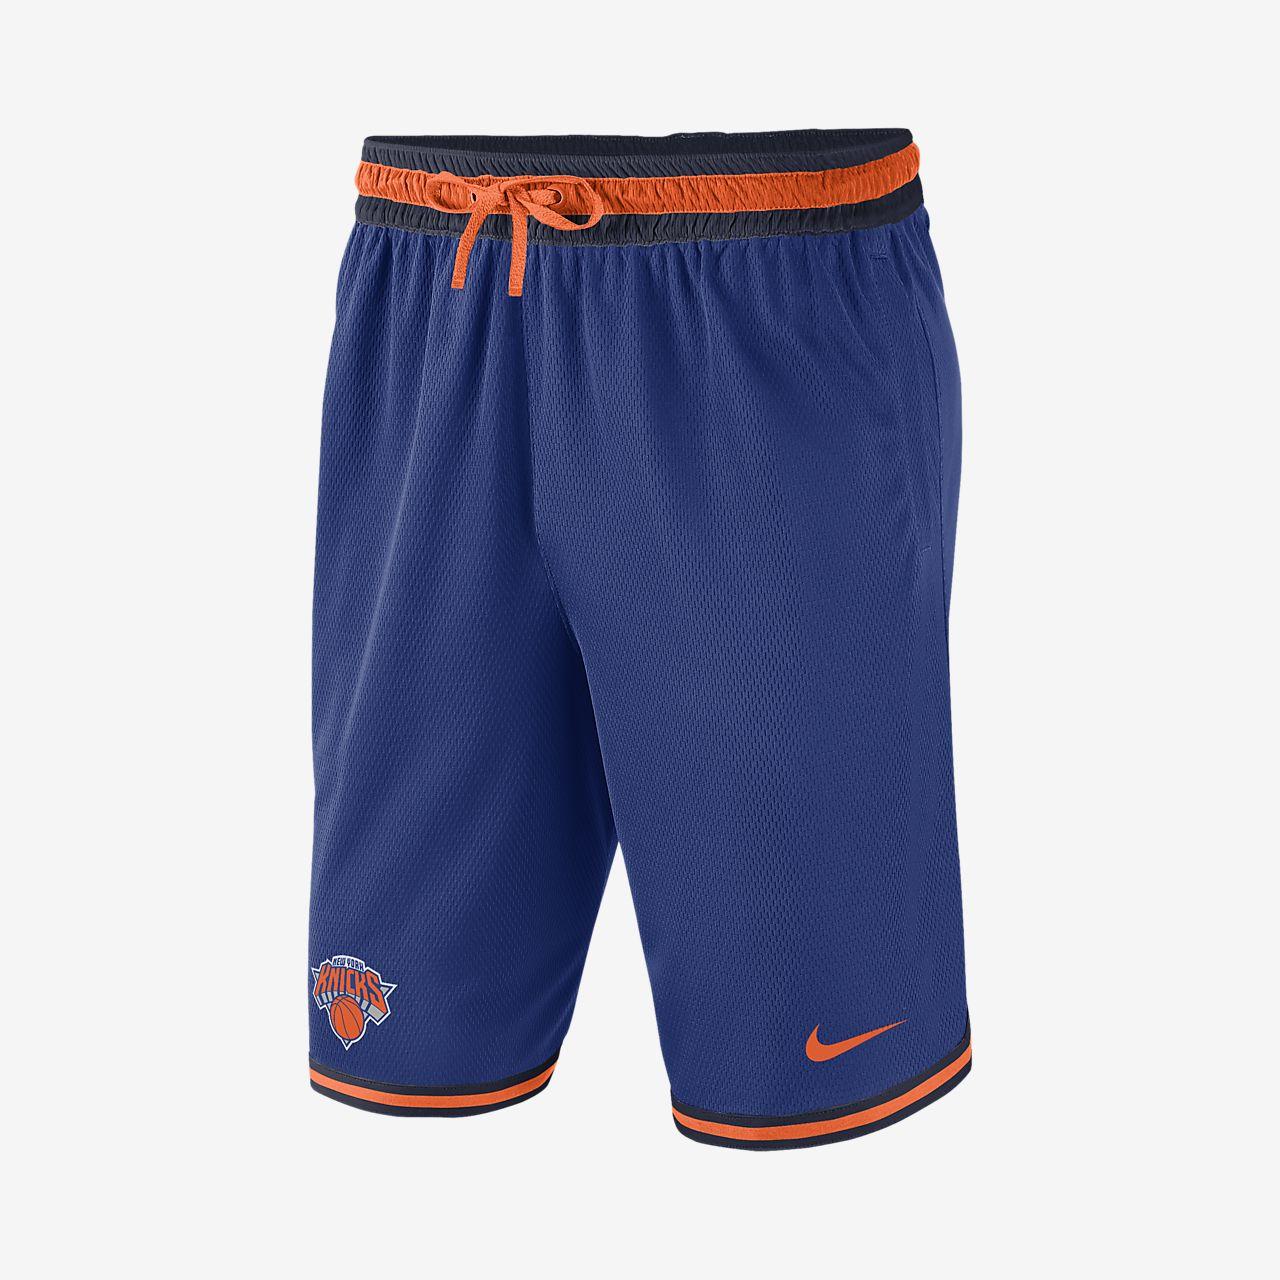 New York Knicks Nike Men's NBA Shorts